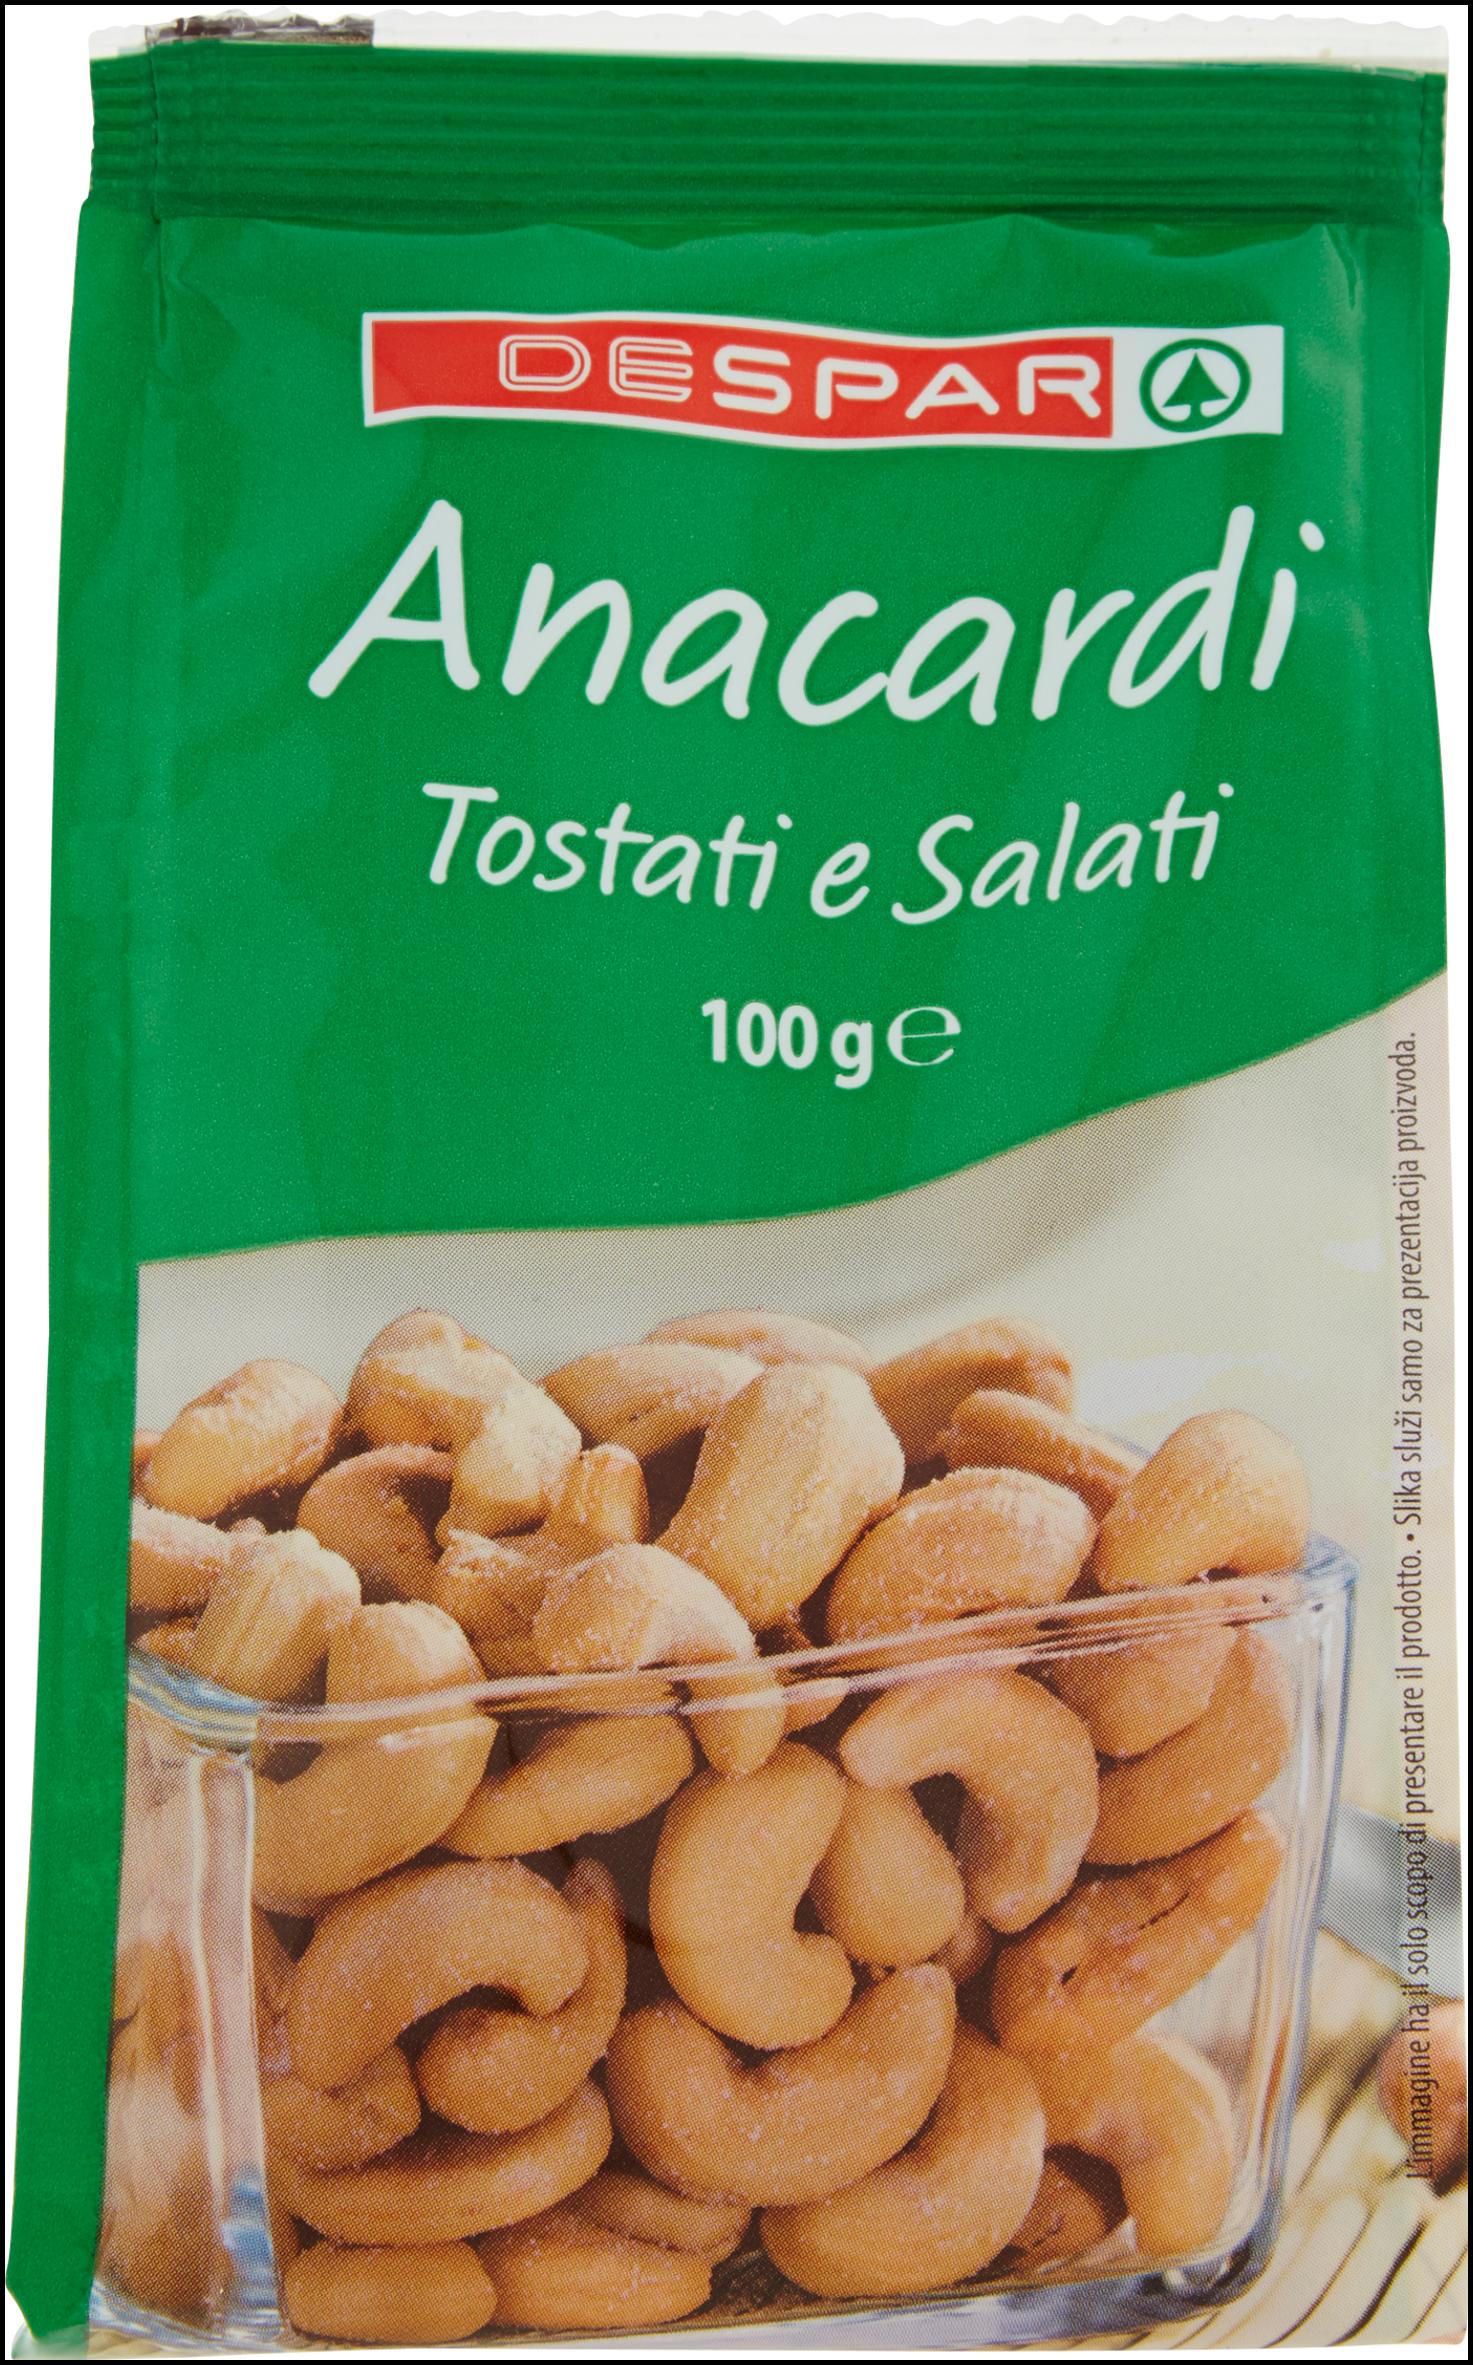 ANACARDI DESPAR 100G TOSTATI E SALATI